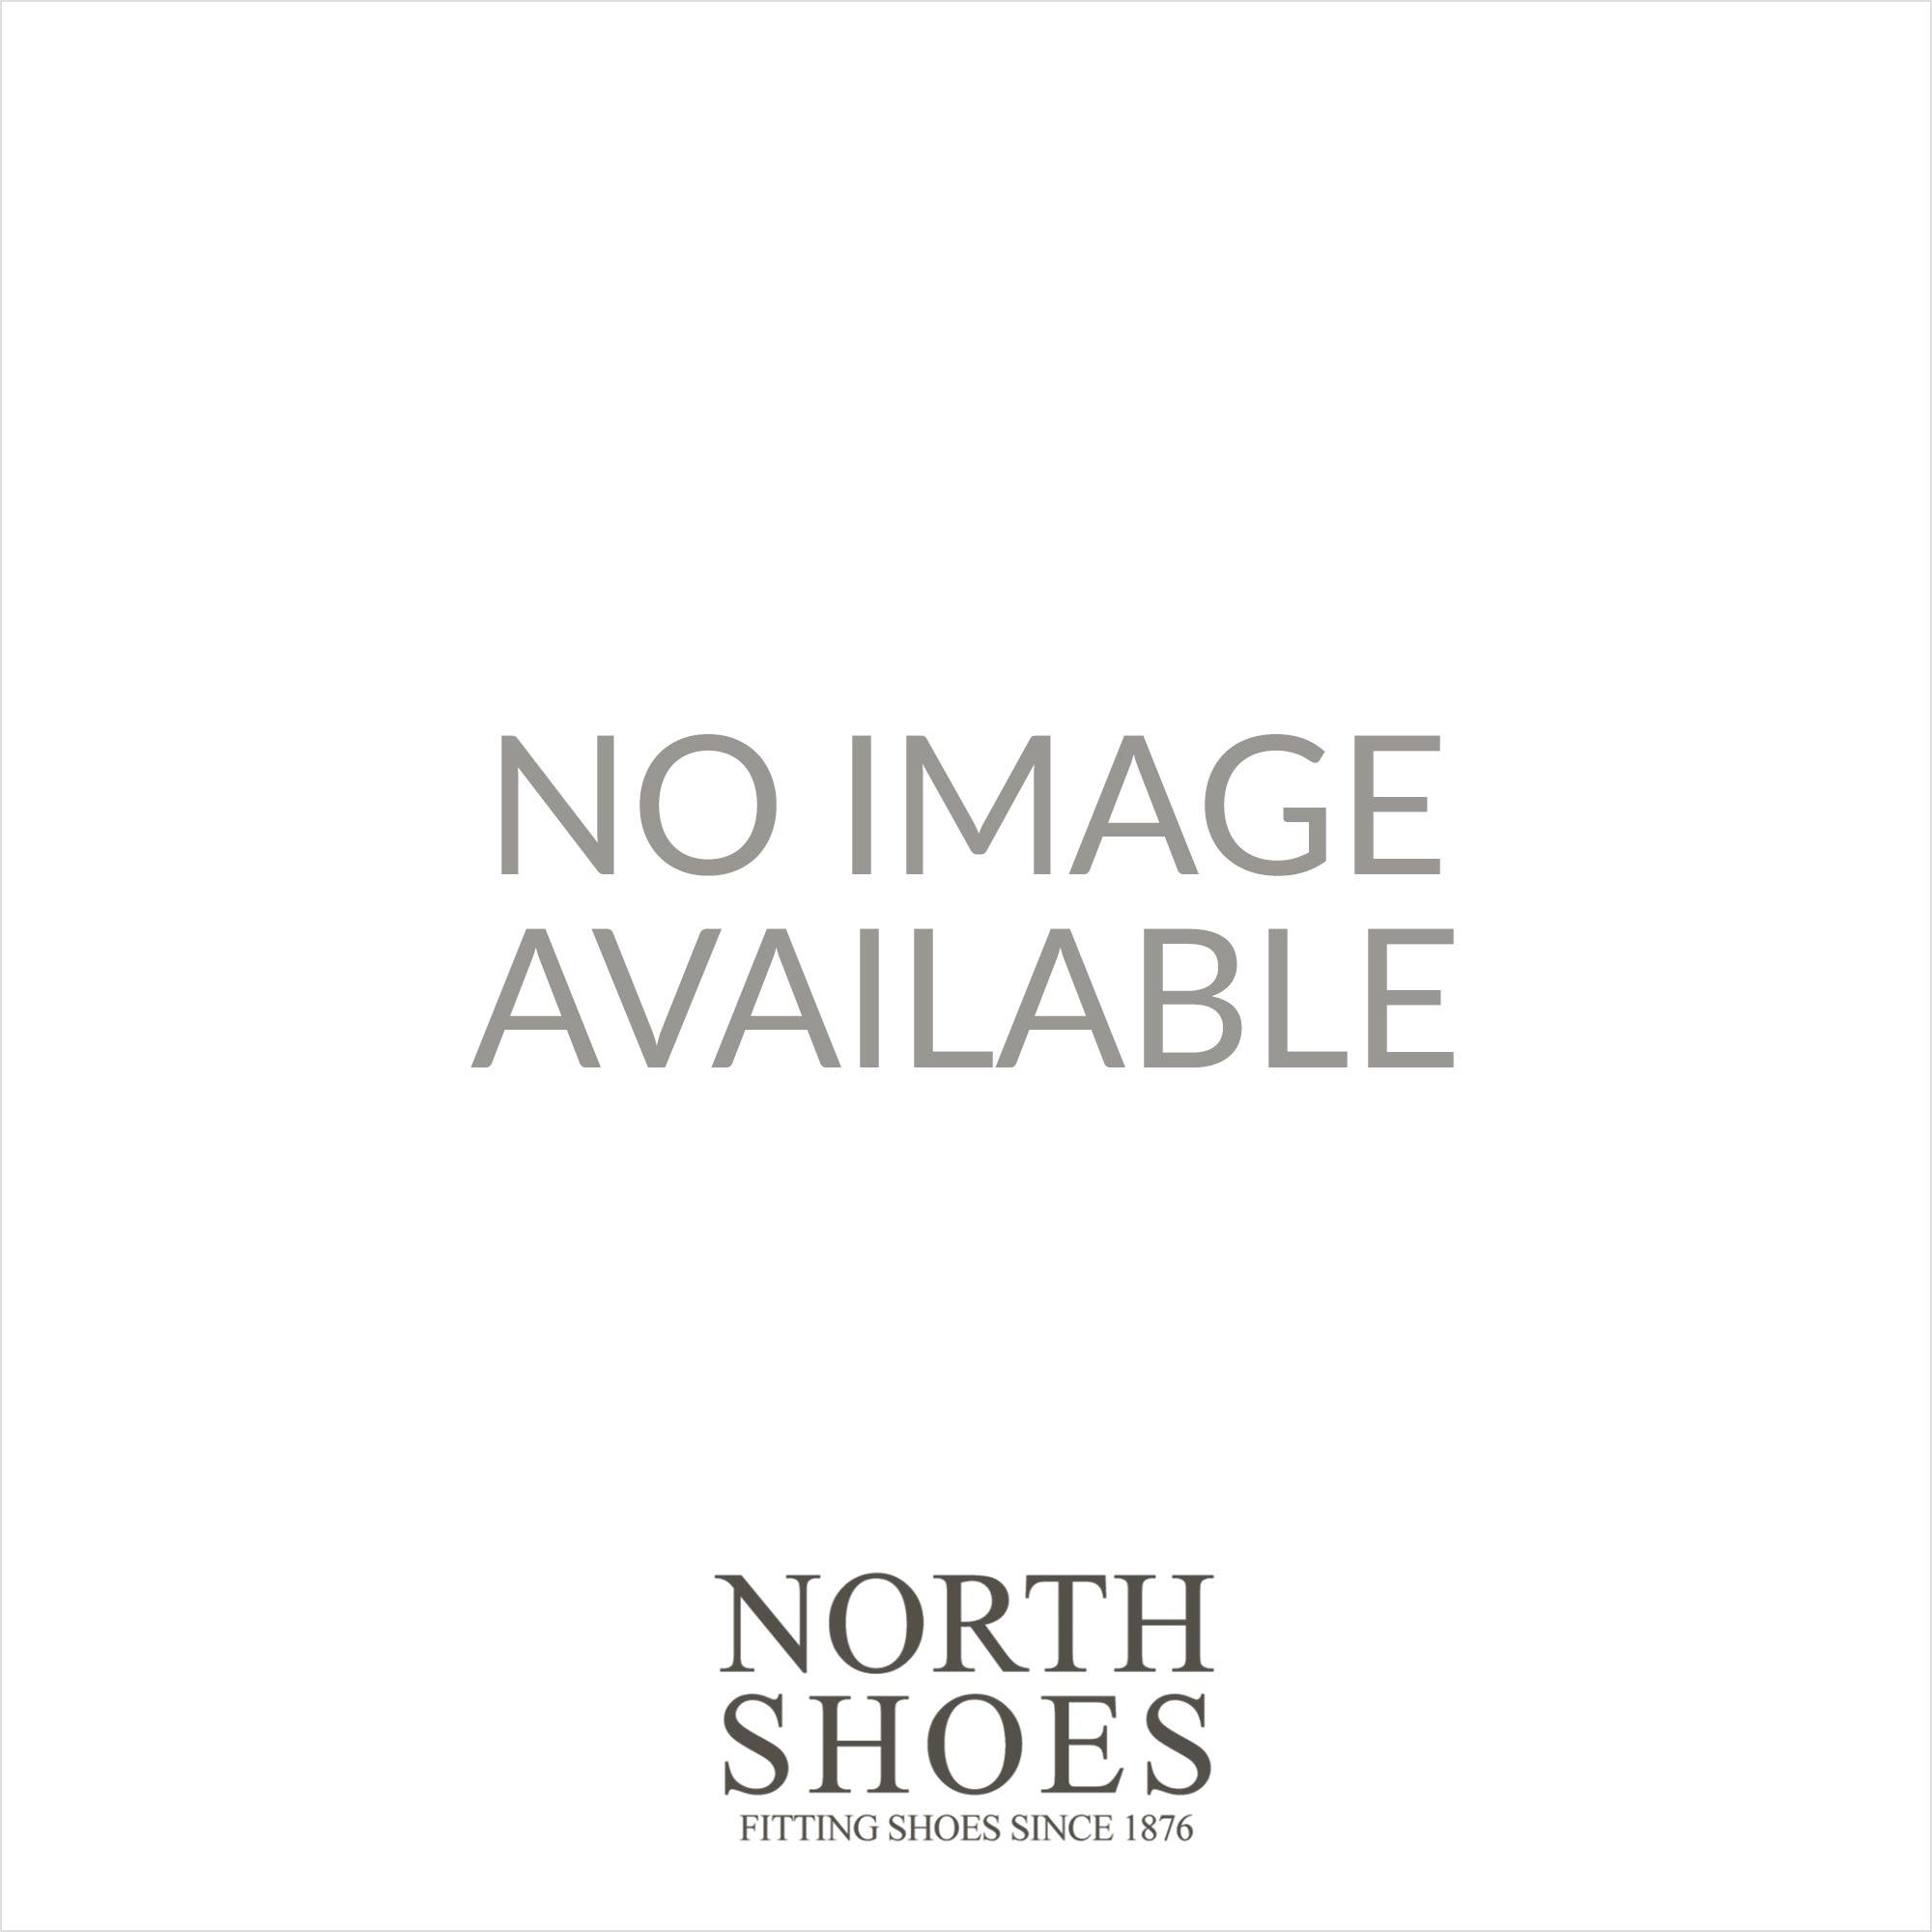 SKECHERS 97451L Black Textile Boys Bungee Lace/Rip Tape Casual Trainer Shoe